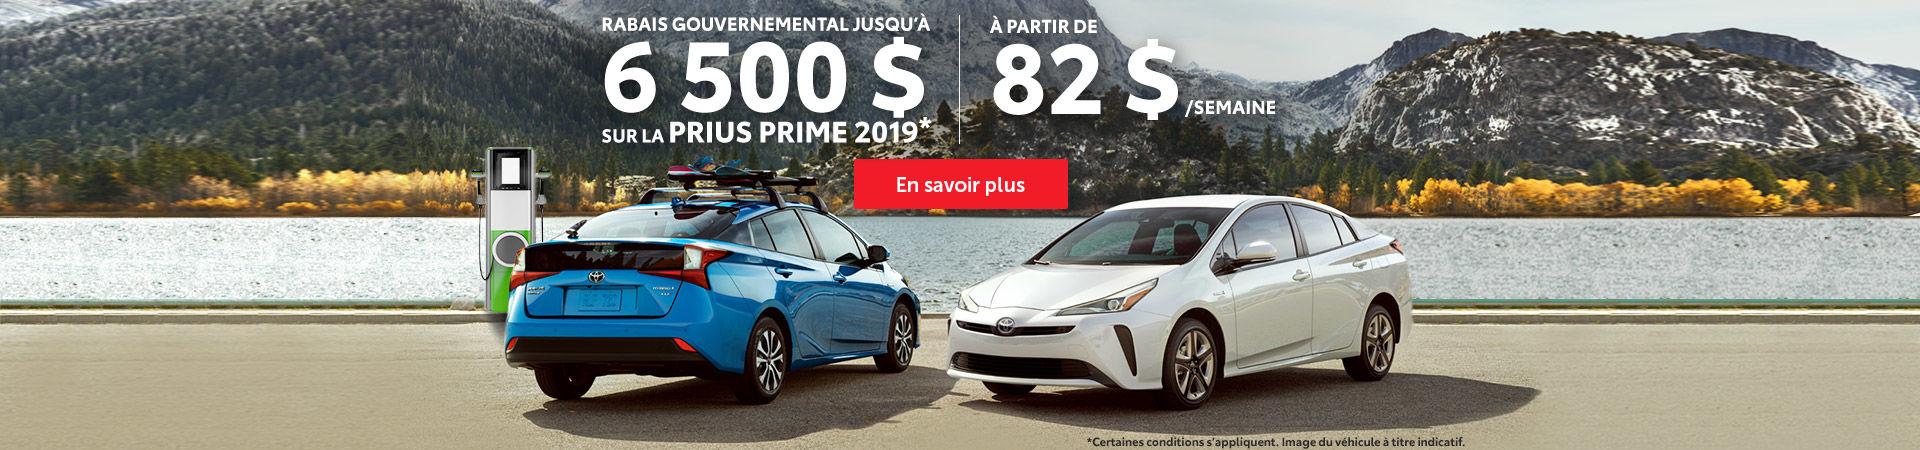 Rabais gouvernemental - Prius Prime 2019